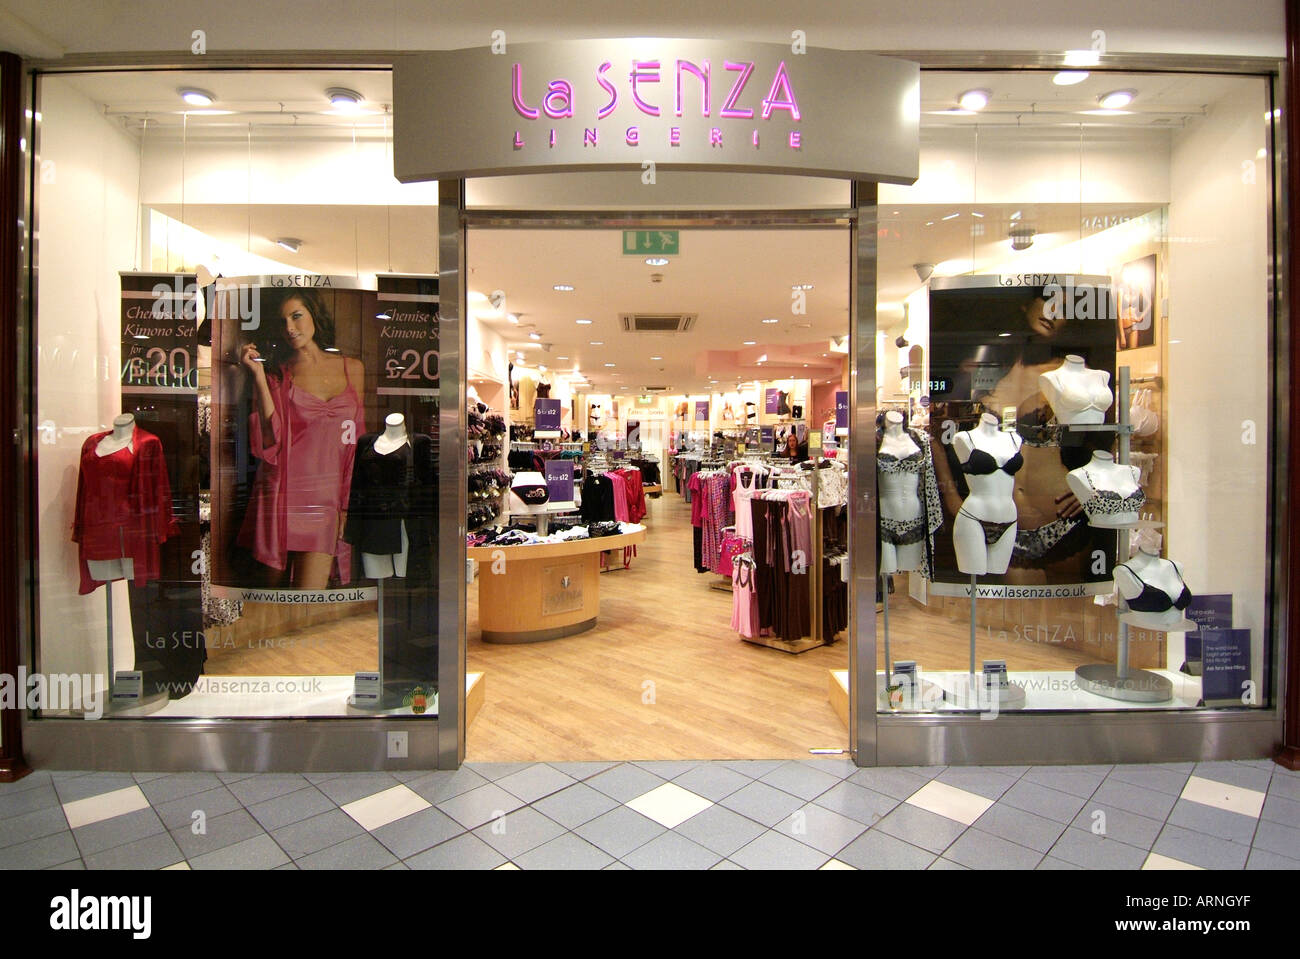 la senza lingerie shop store UK United Kingdom England Europe GB ...